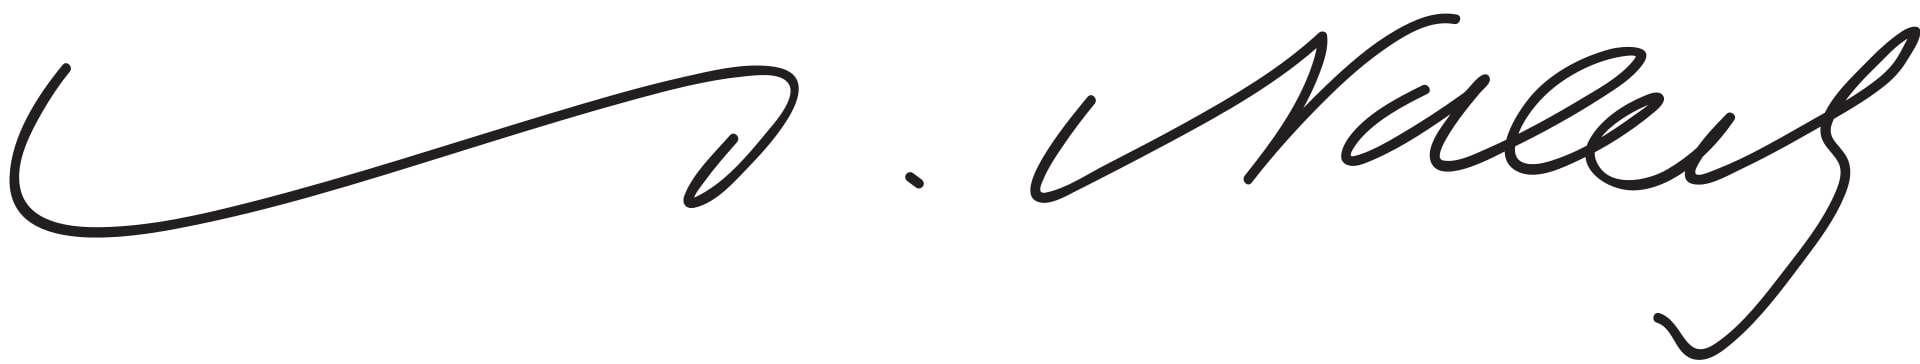 Alfred Nobel Signature